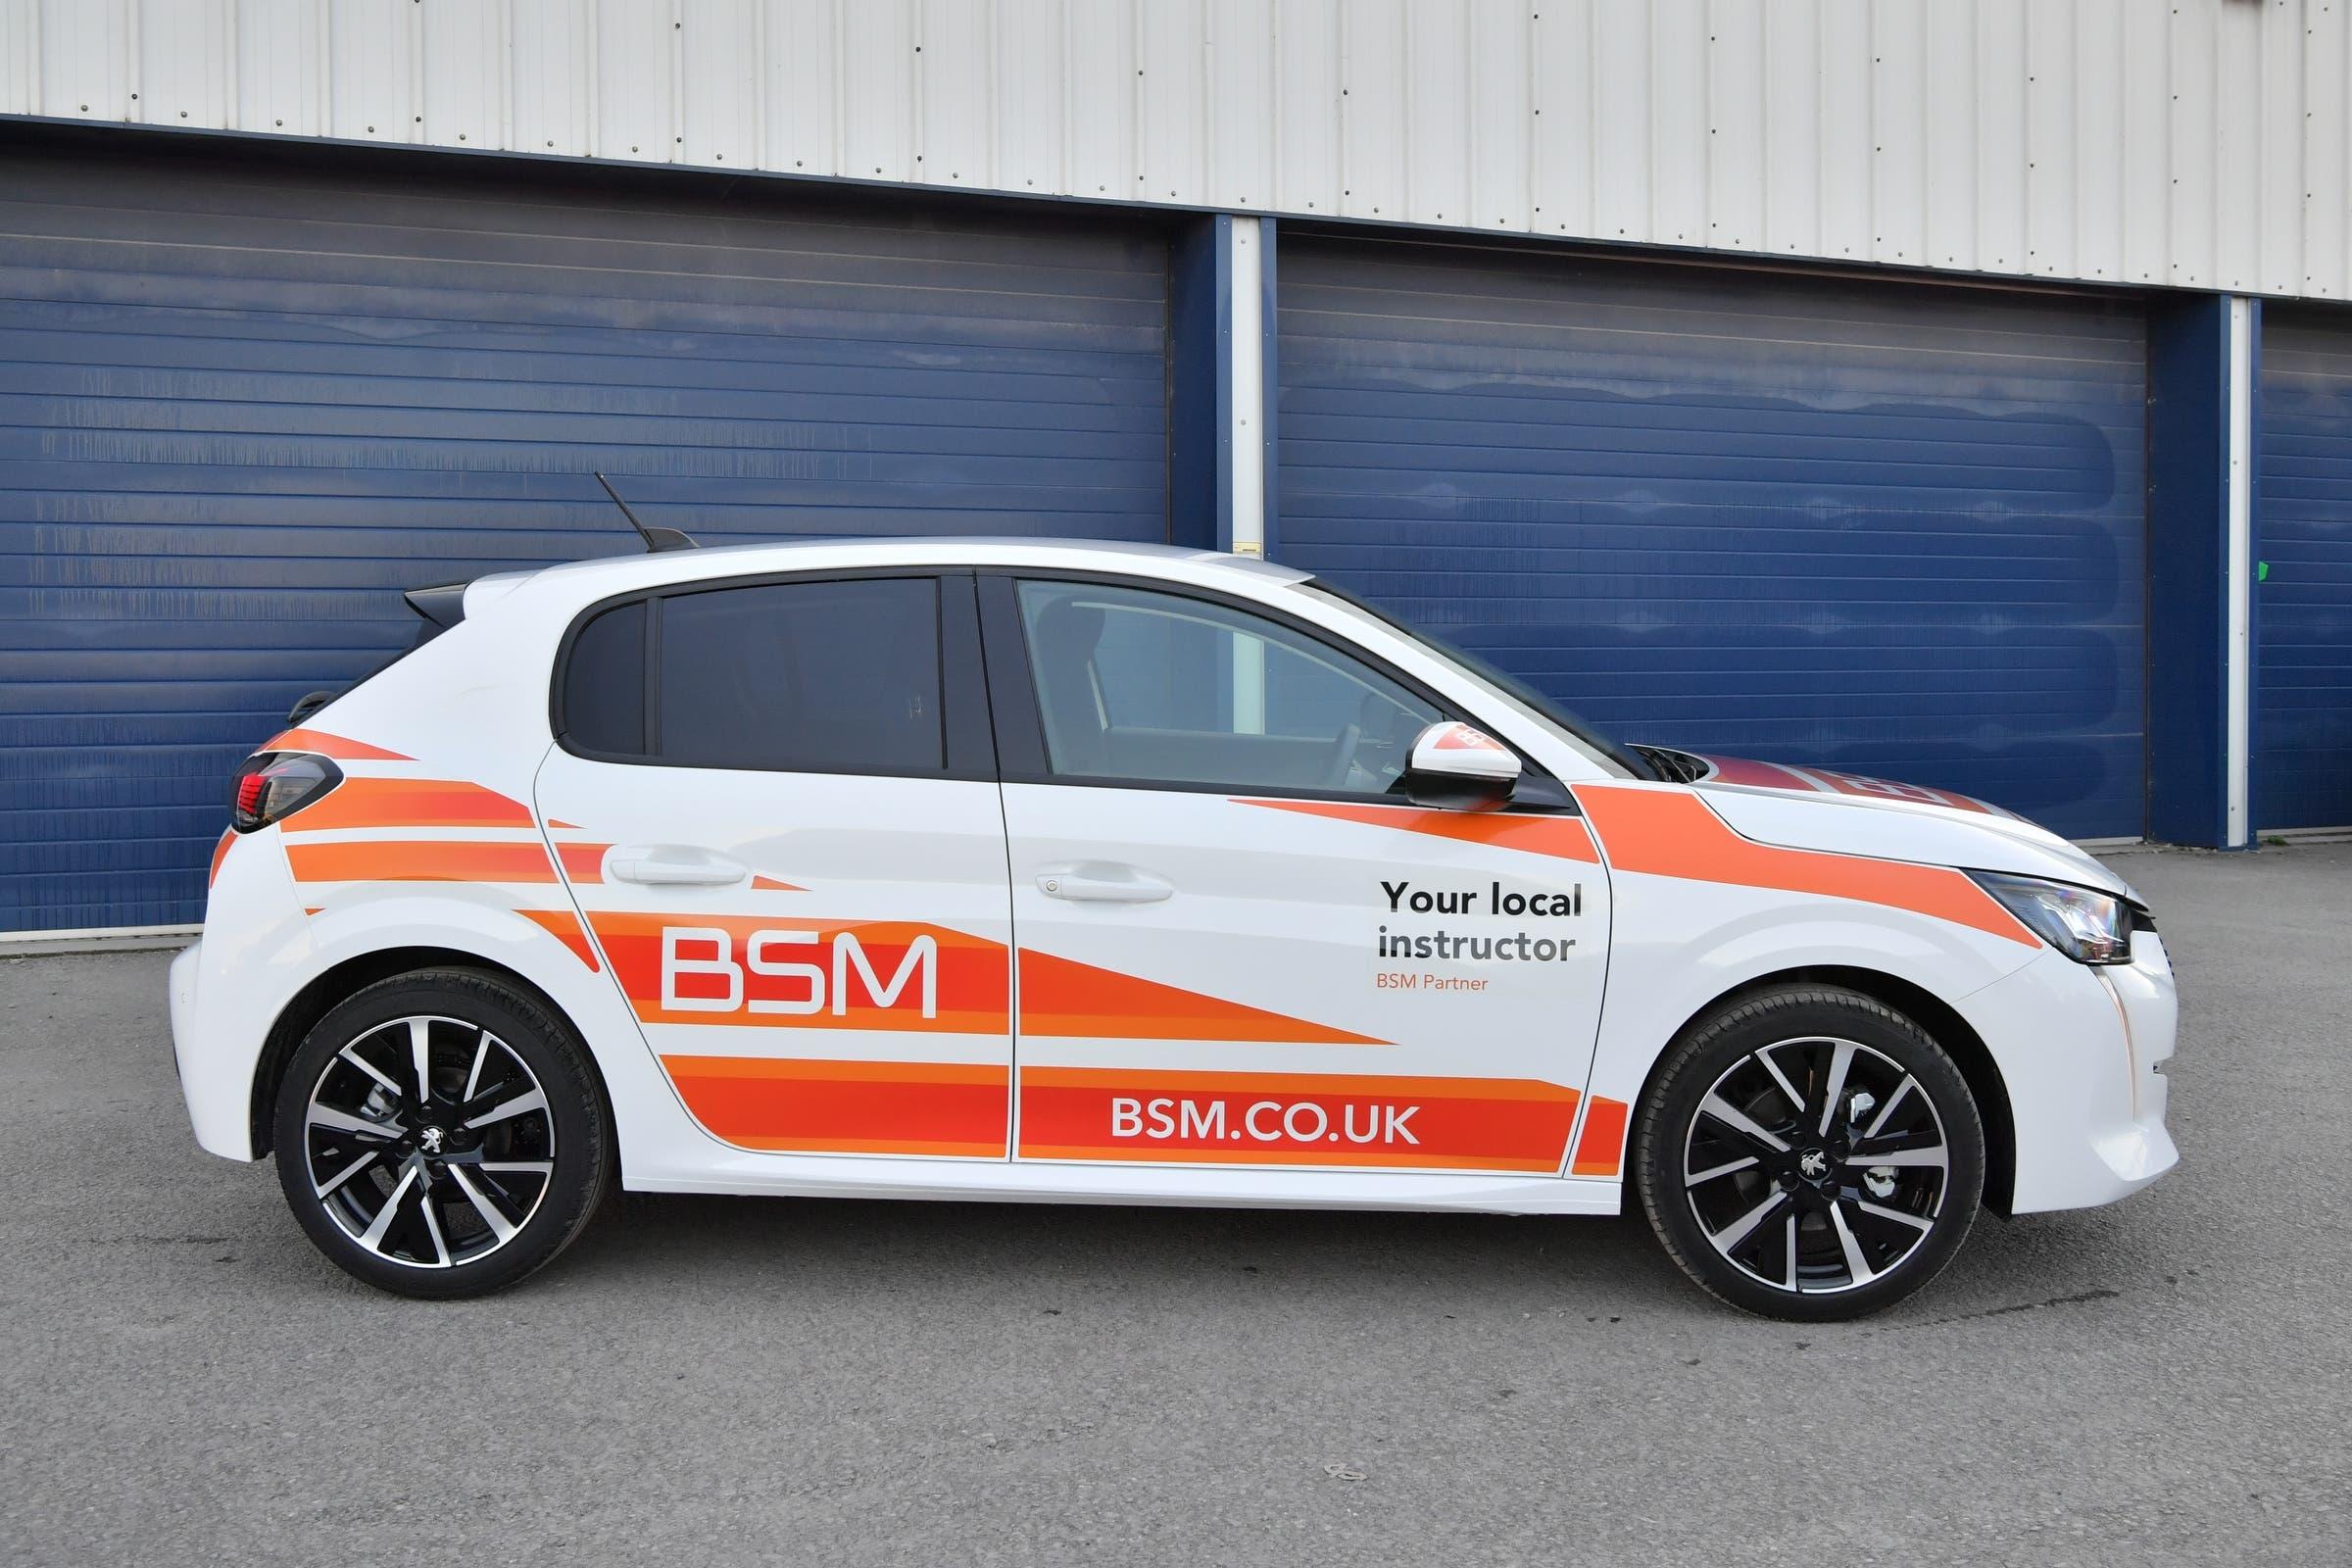 Peugeot 208 British School of Motoring